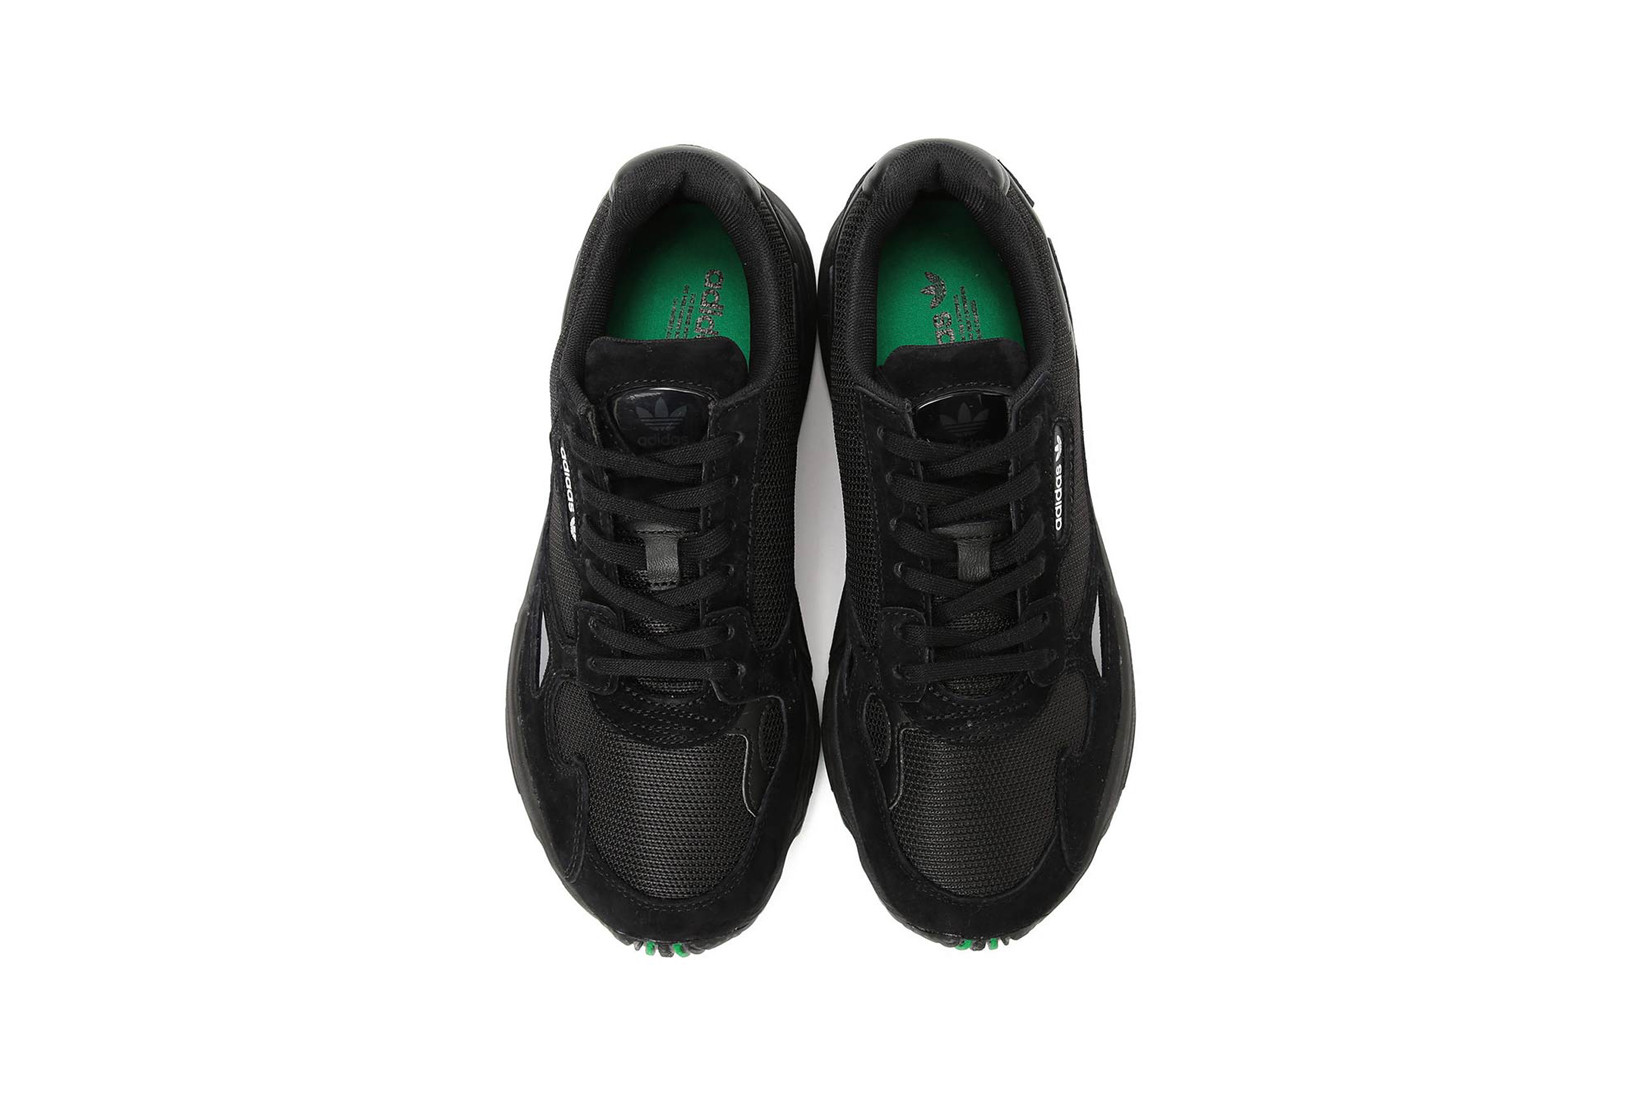 BEAMS x adidas Falcon in Black and